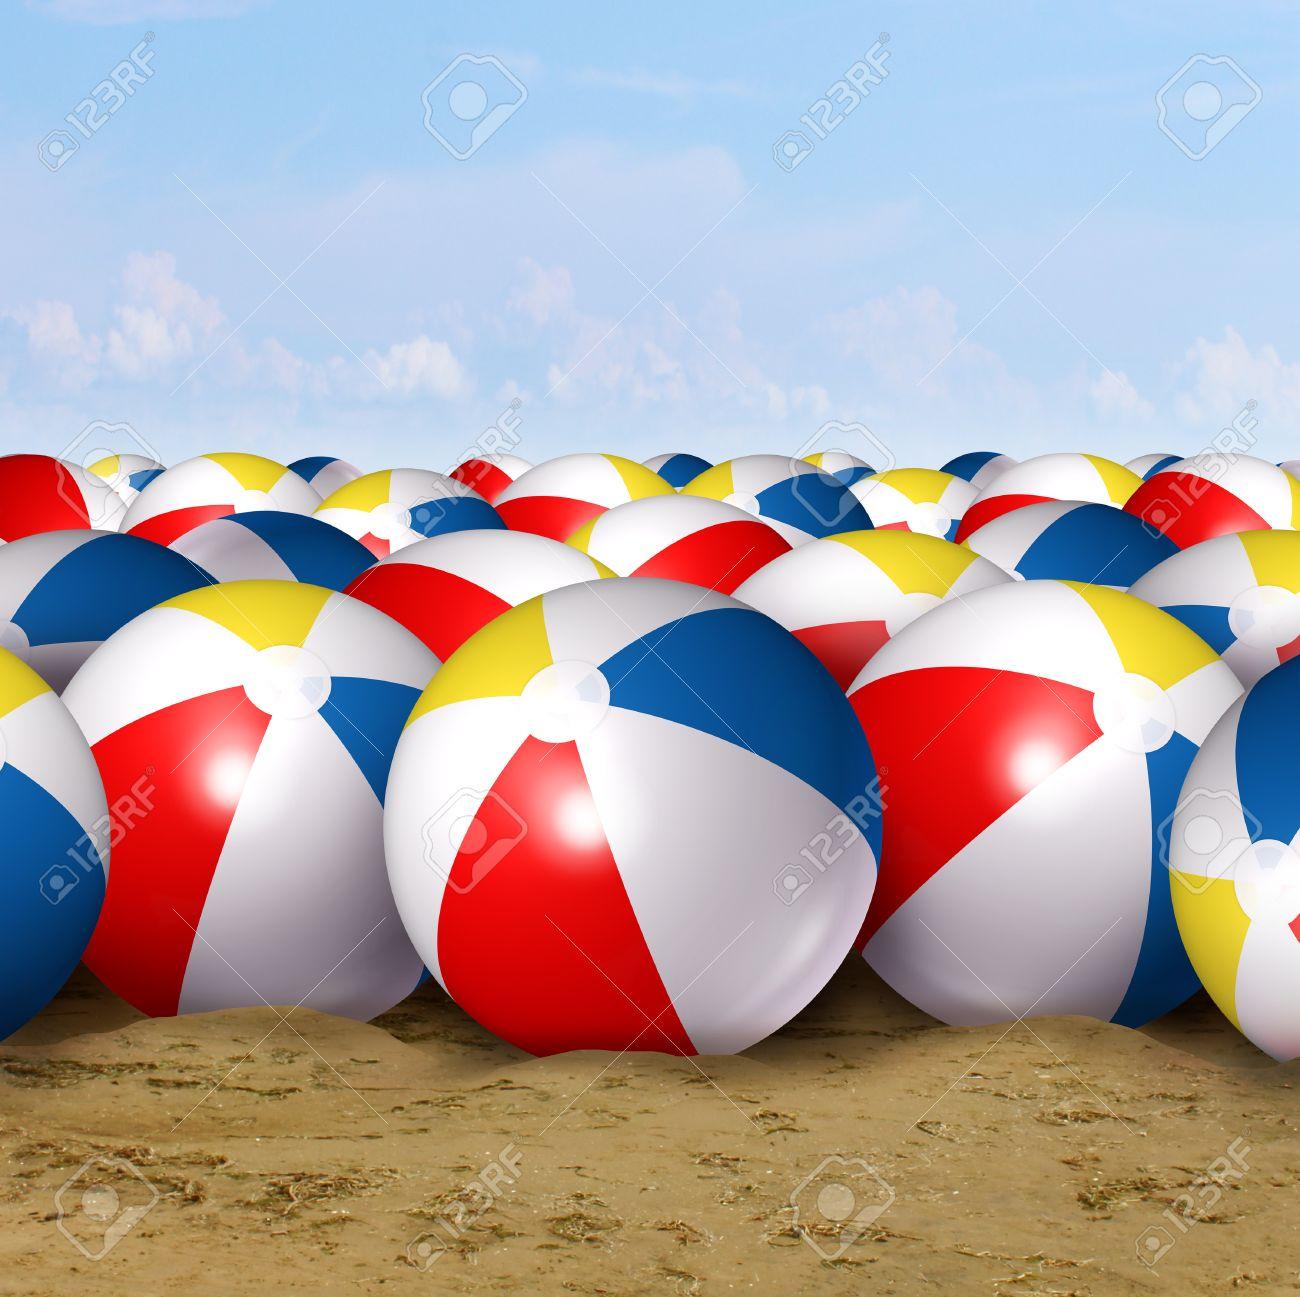 Beach ball in ocean Colourful Beach Ball Background As Classic Symbol Of Summer Fun At The Ocean With Group 123rfcom Beach Ball Background As Classic Symbol Of Summer Fun At The